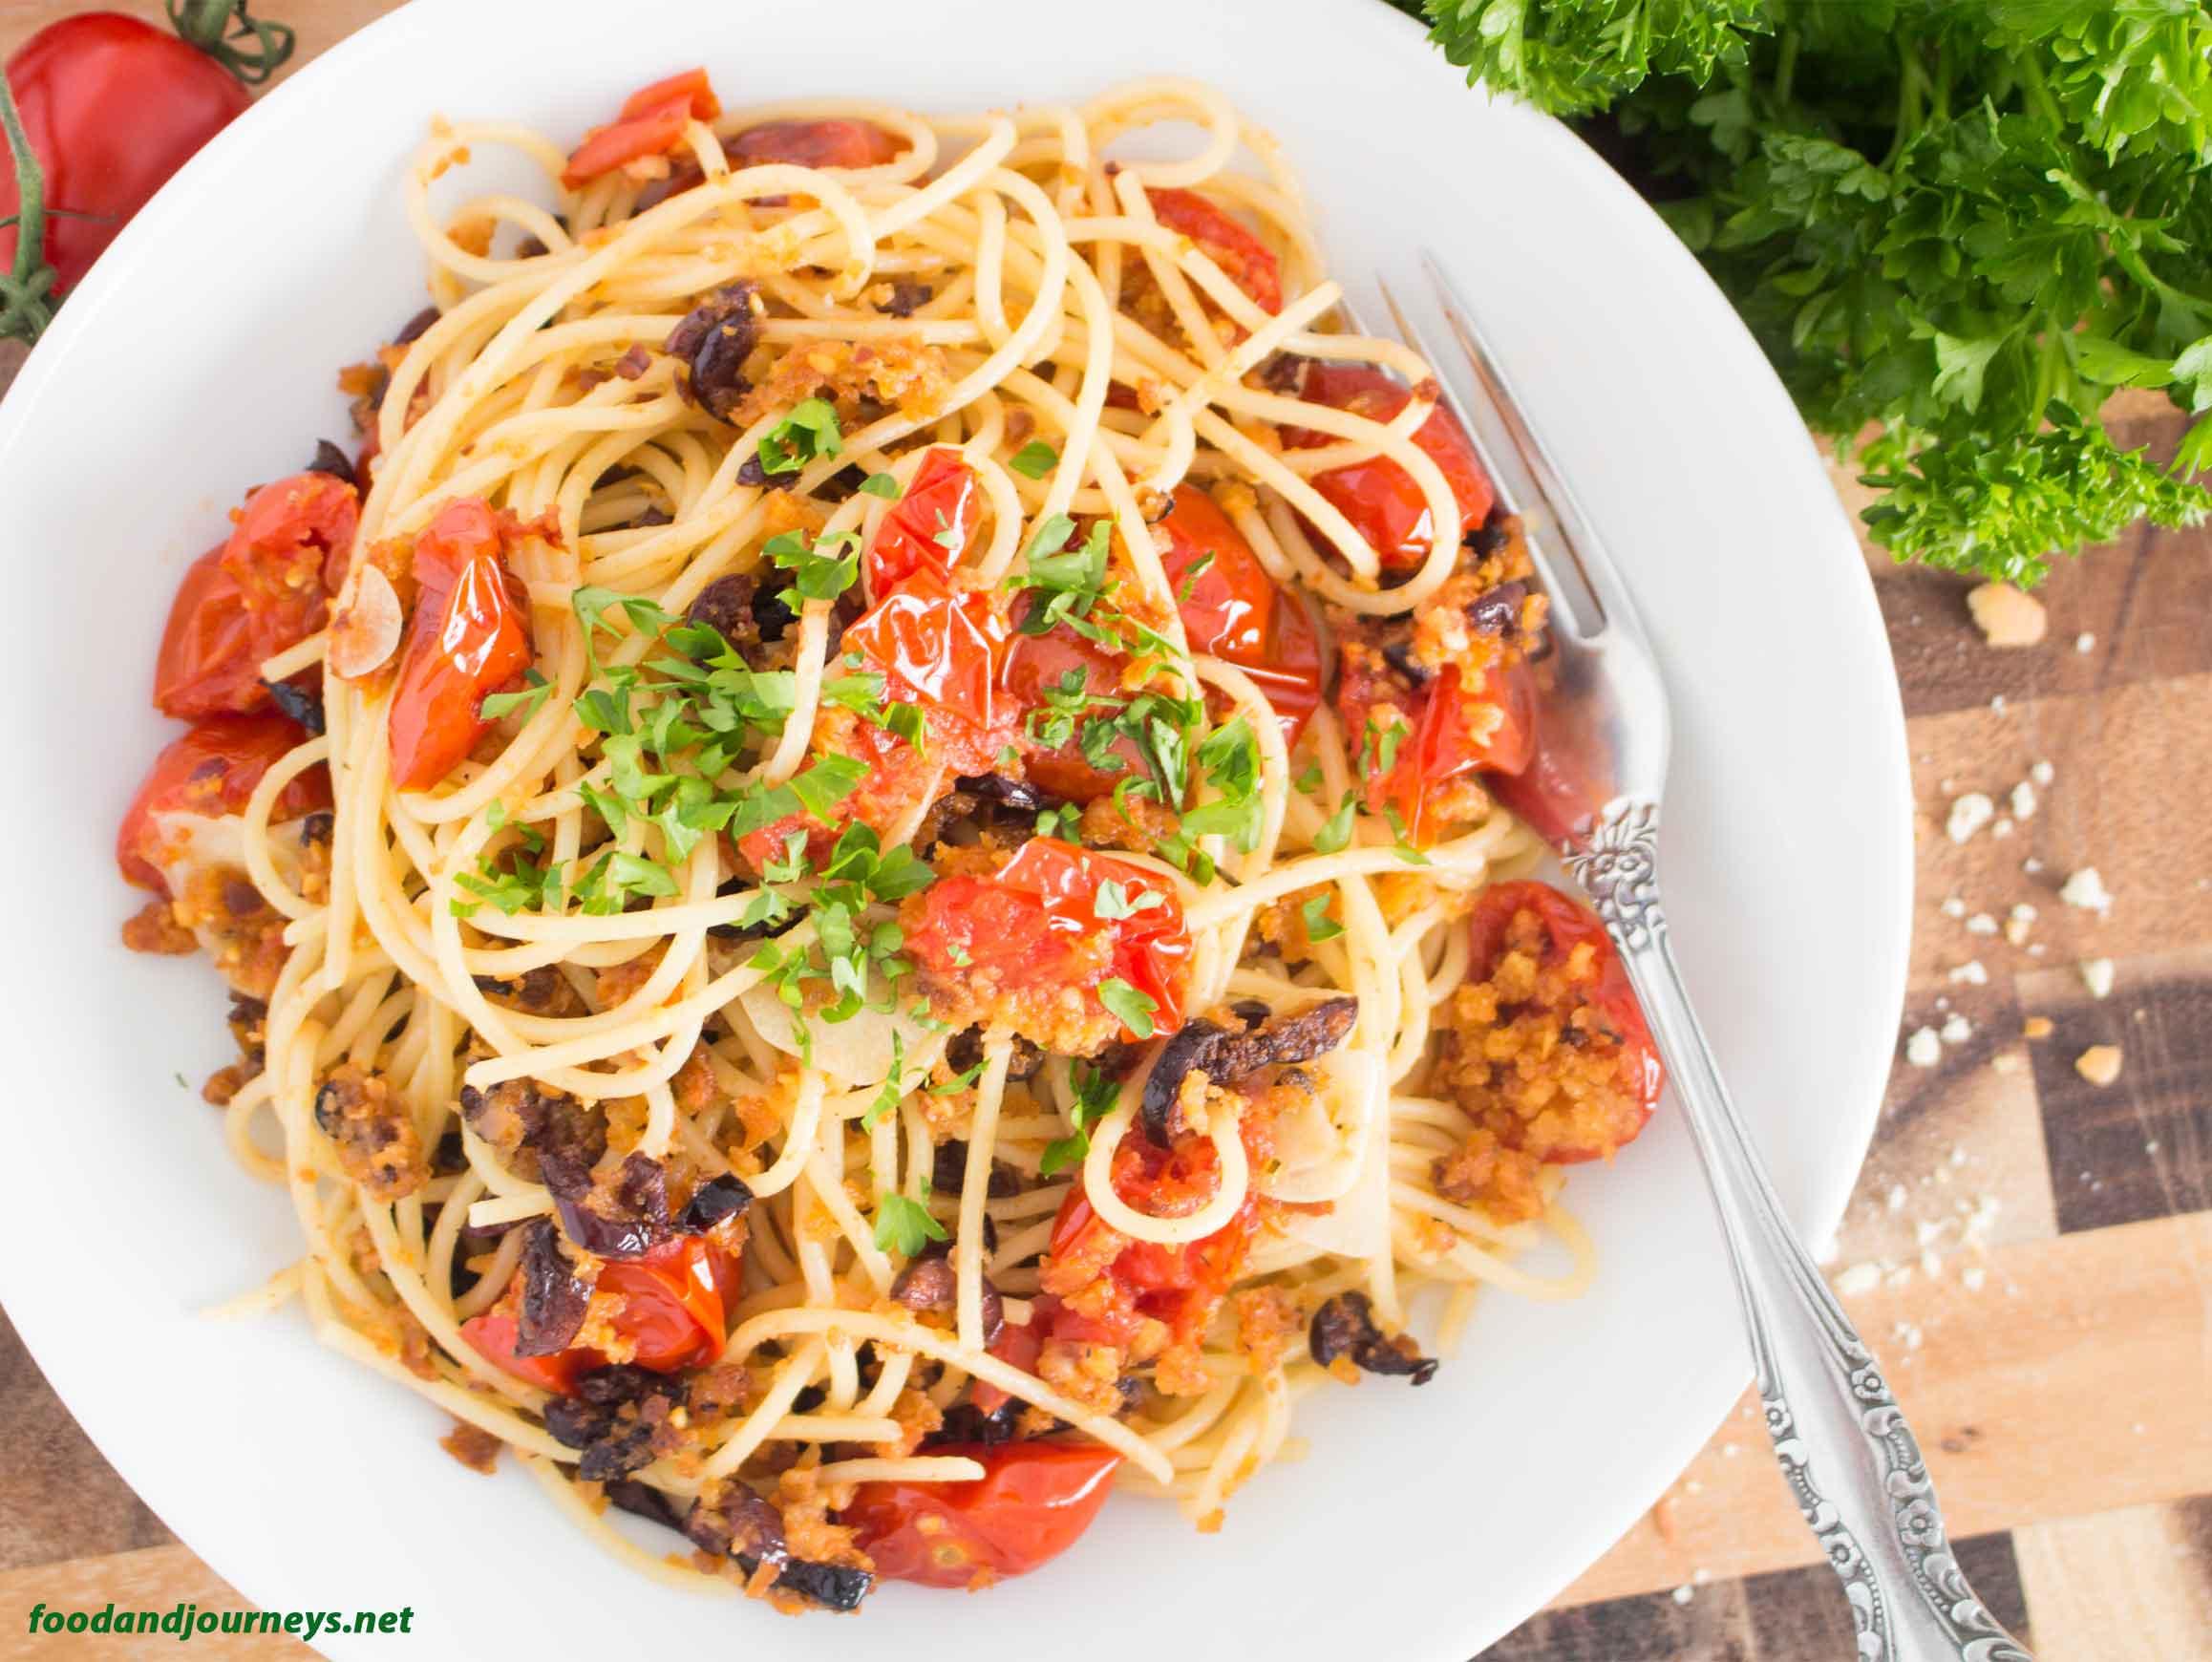 Roasted Breadcrumbs and Cherry Tomatoes Pasta MainPic|foodandjourneys.net